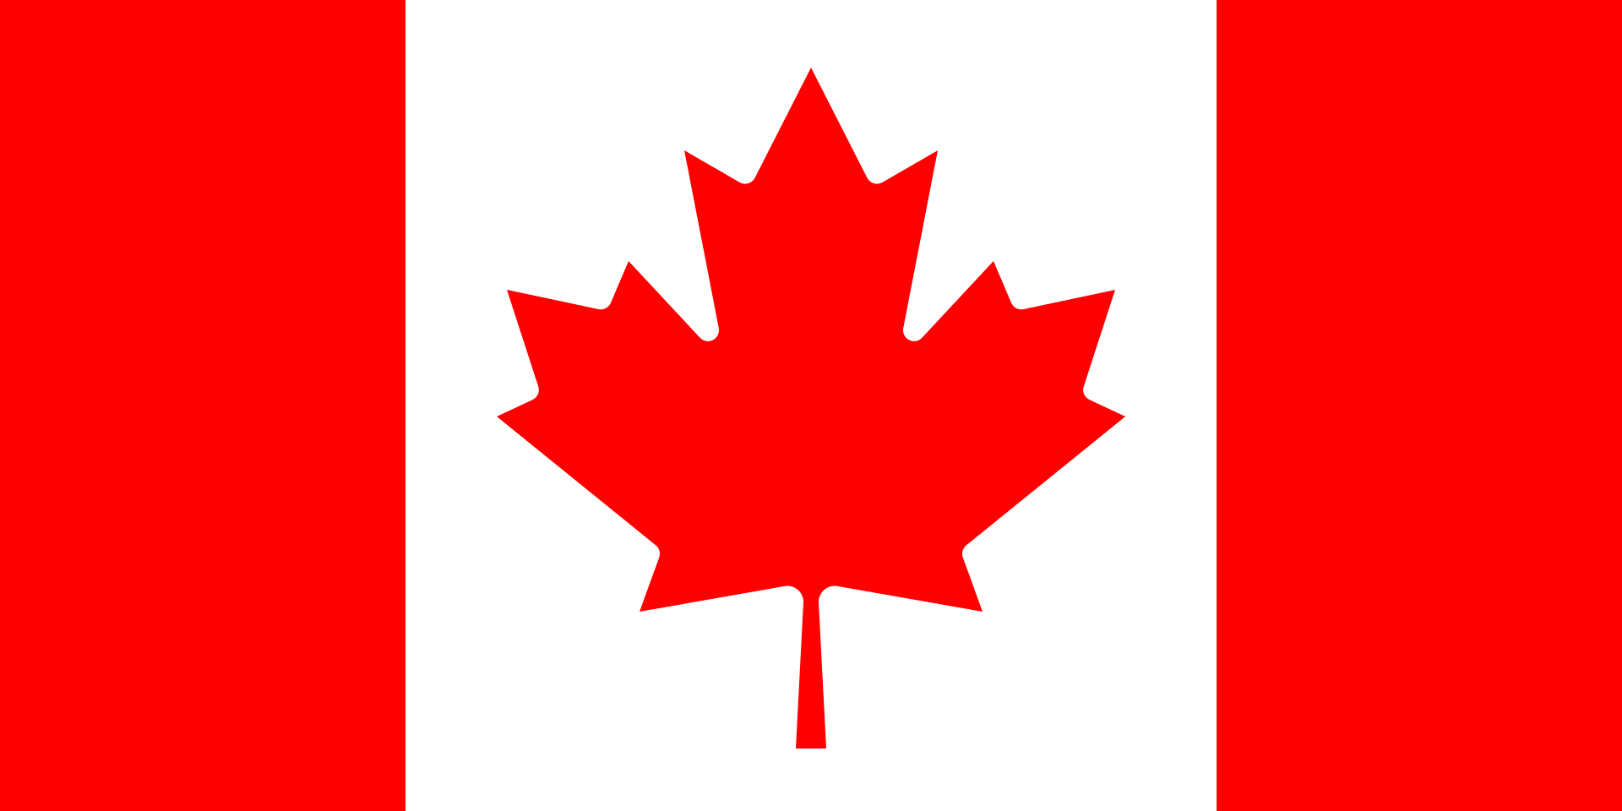 Flagge im Querformat Land Kanada 150x100 cm